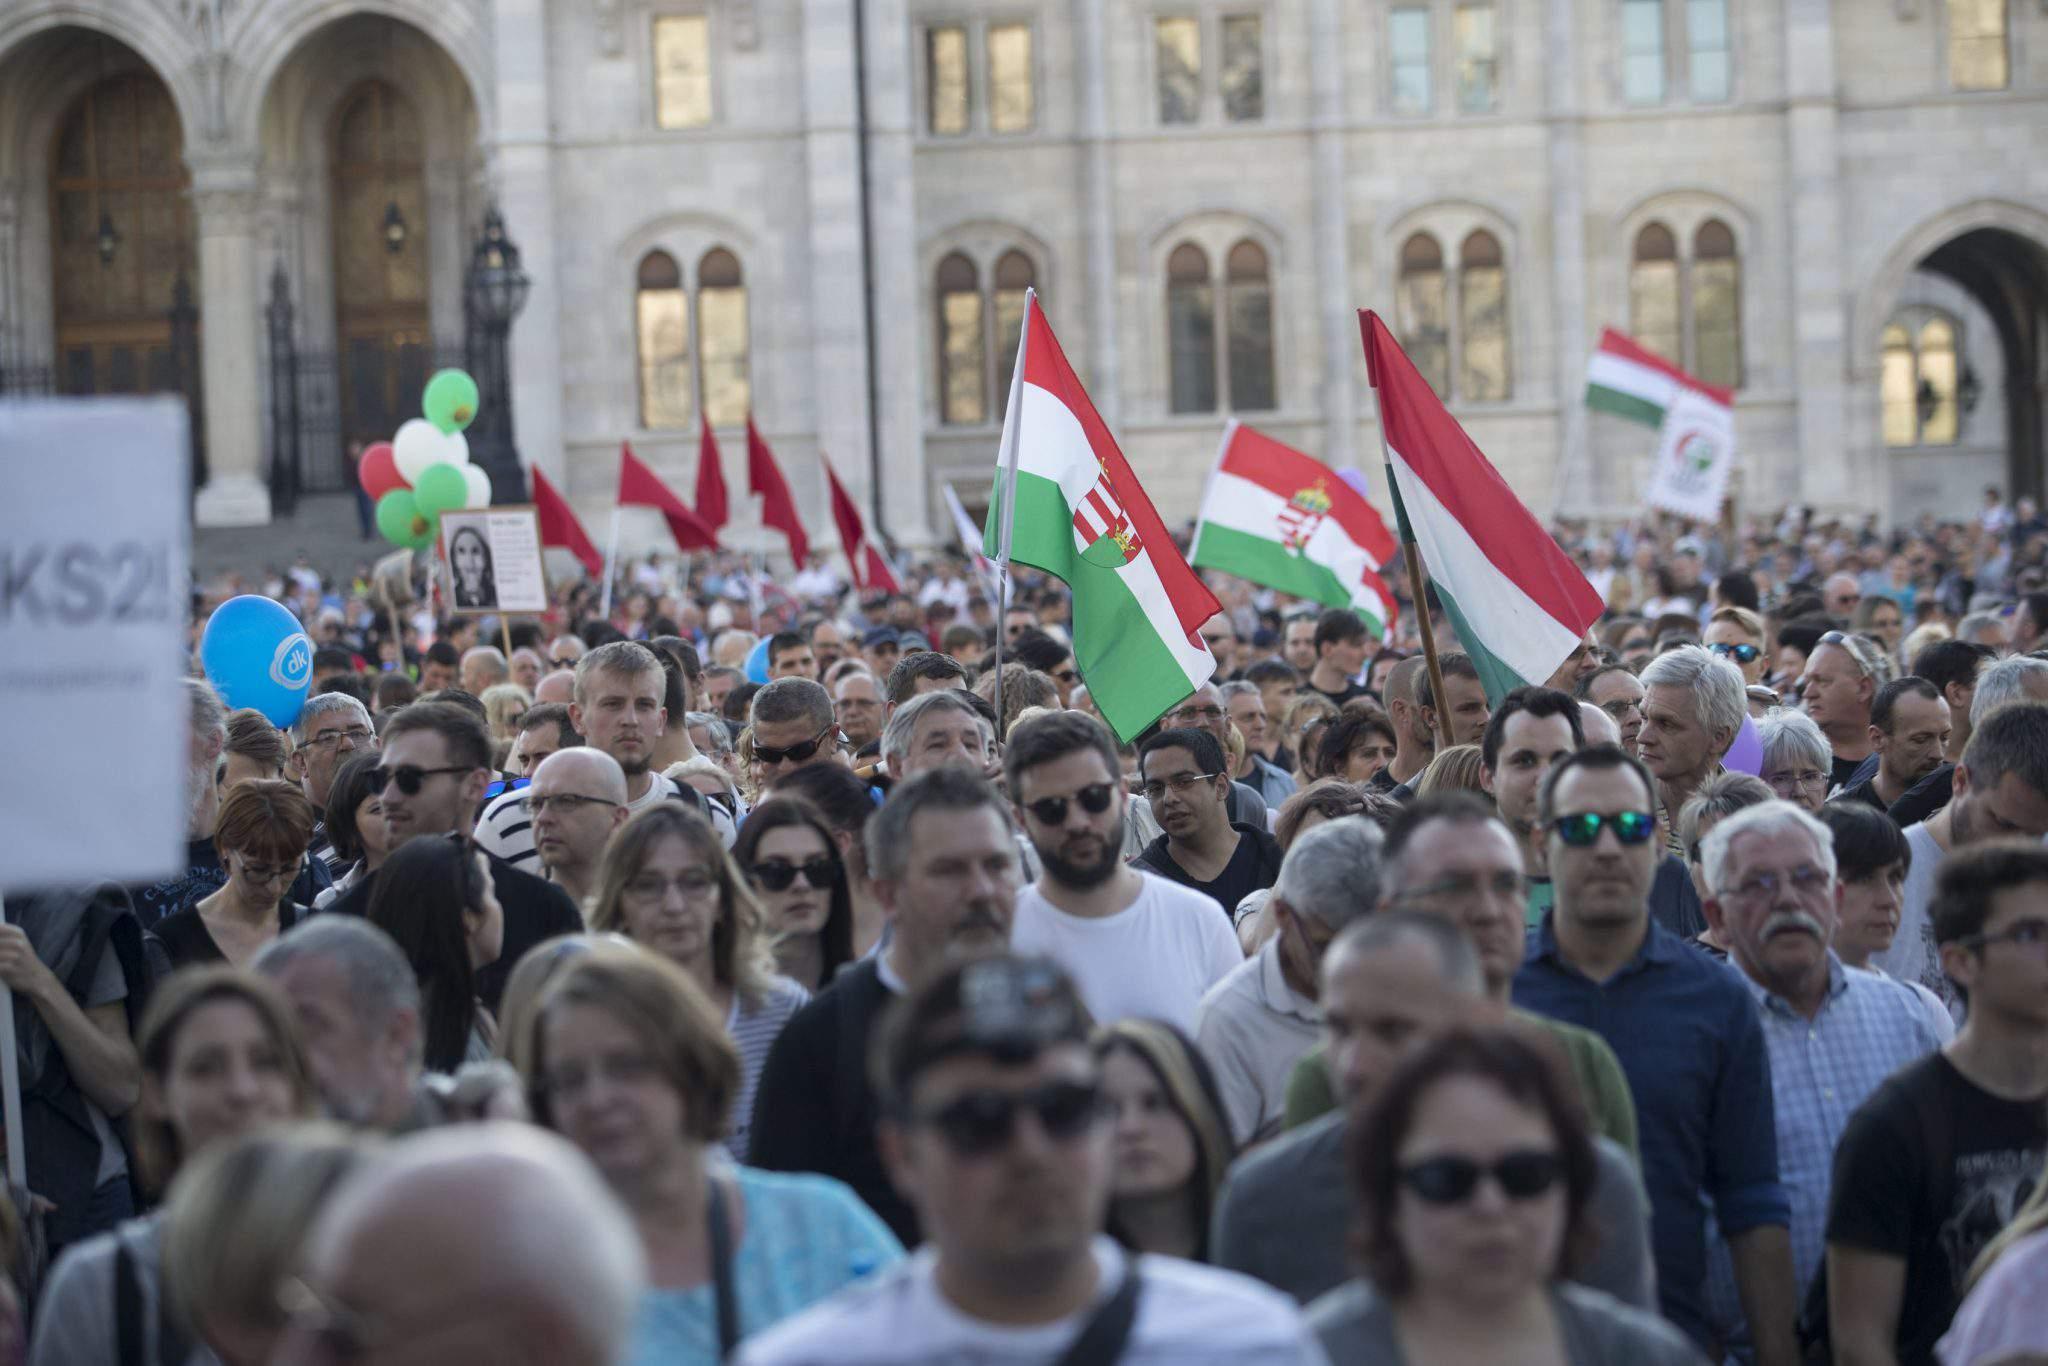 Demonstrators protest for democracy in Budapest, photo: Balázs Béli